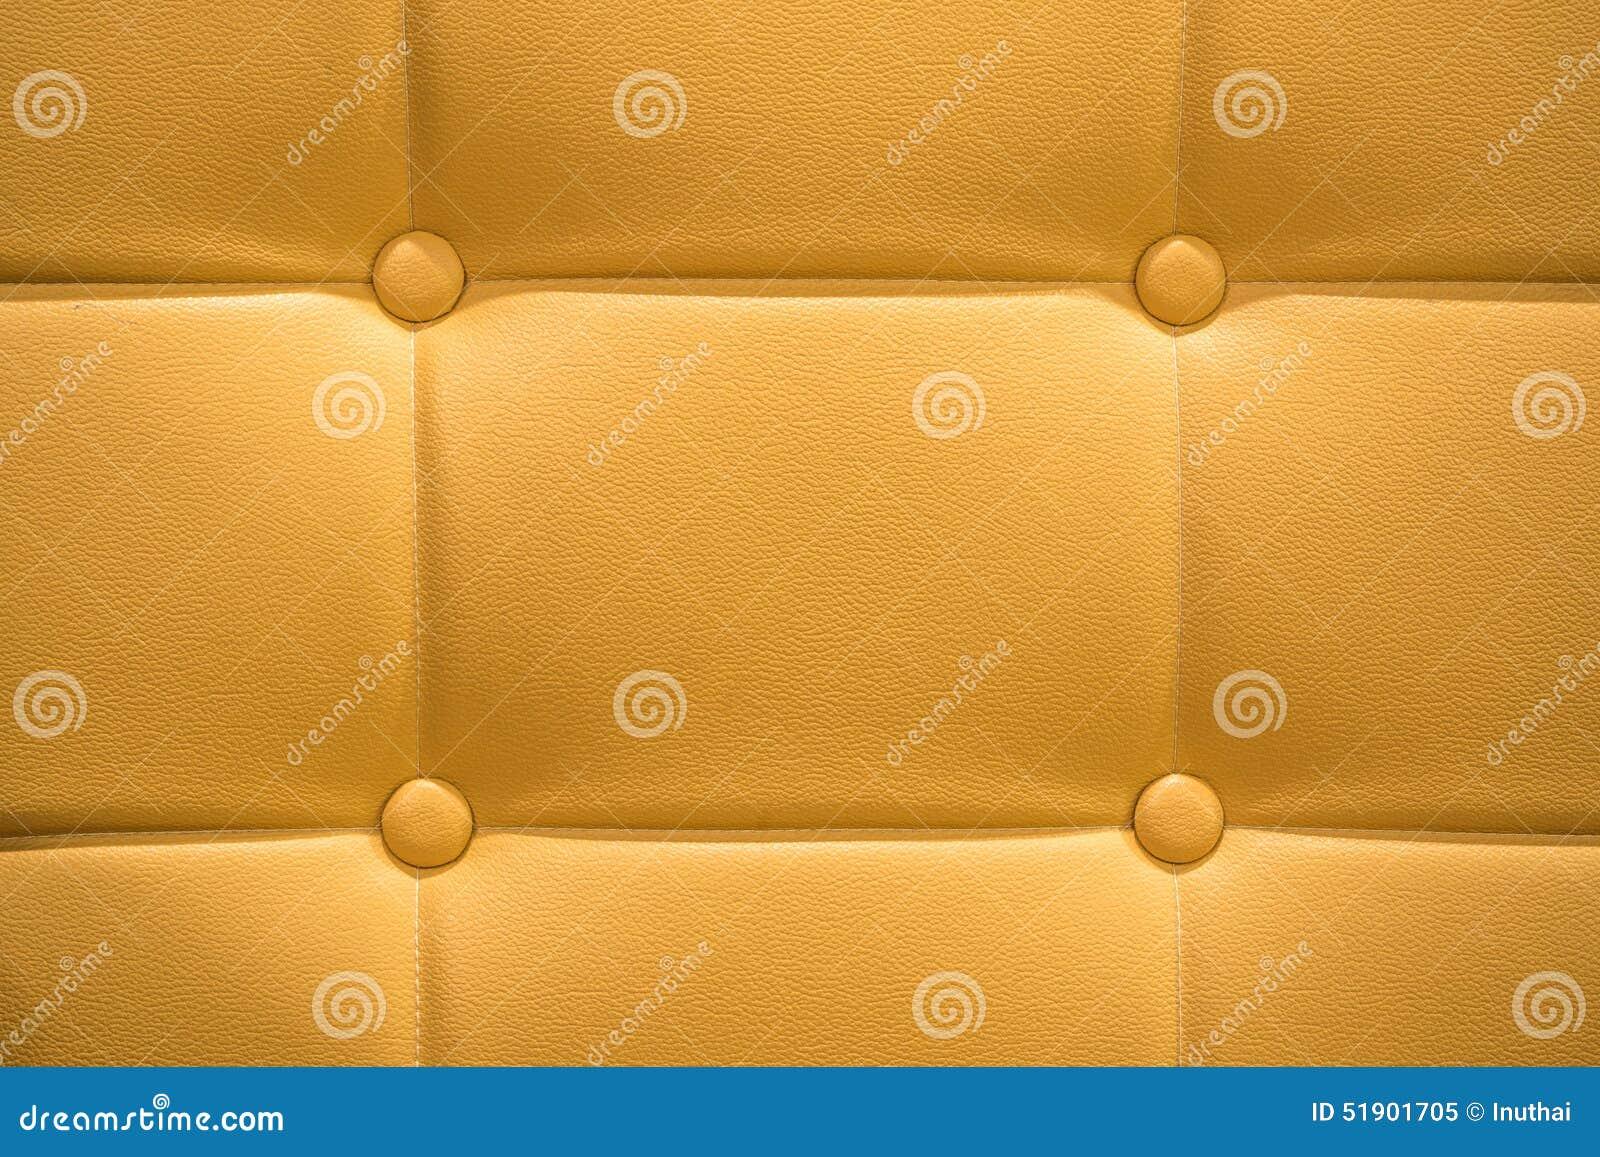 Leather Skin Sofa Material